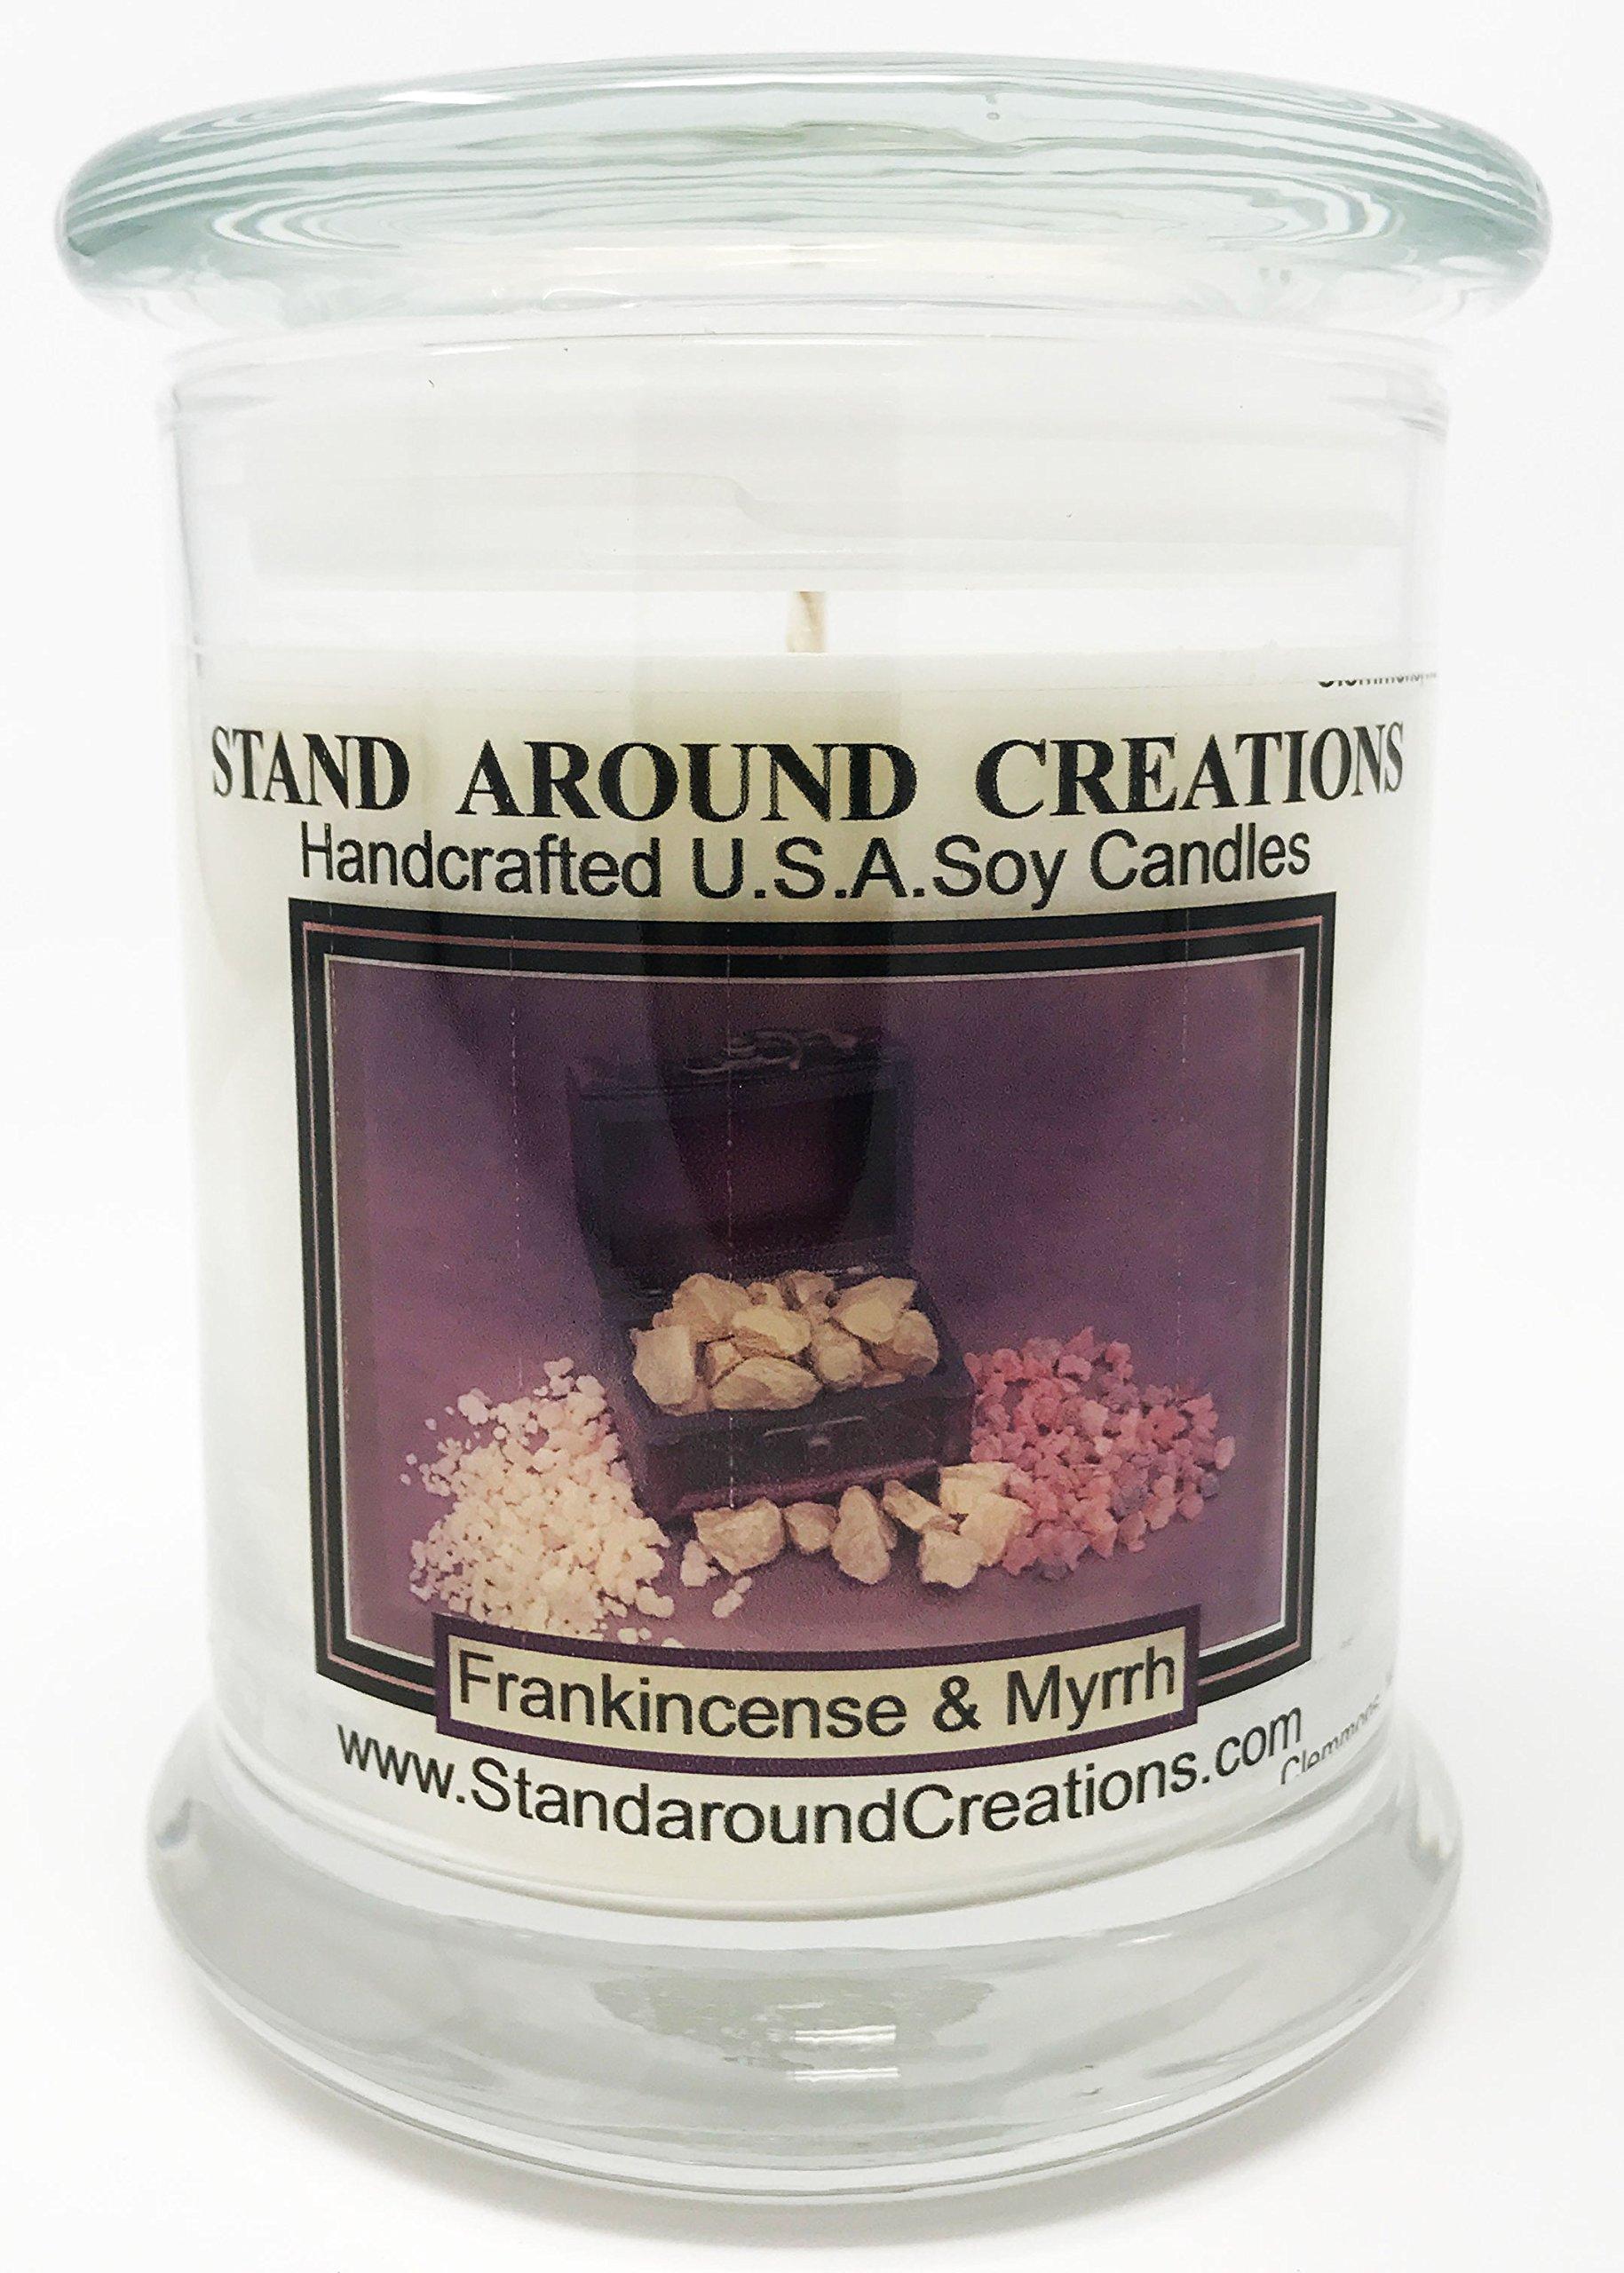 Premium 100% Soy Candle - 12 oz. Status Jar - Frankincense And Myrrh: A irresistible blend of bergamot, patchouli, sandalwood, myrrh essential oils. Naturally Strong Scented.